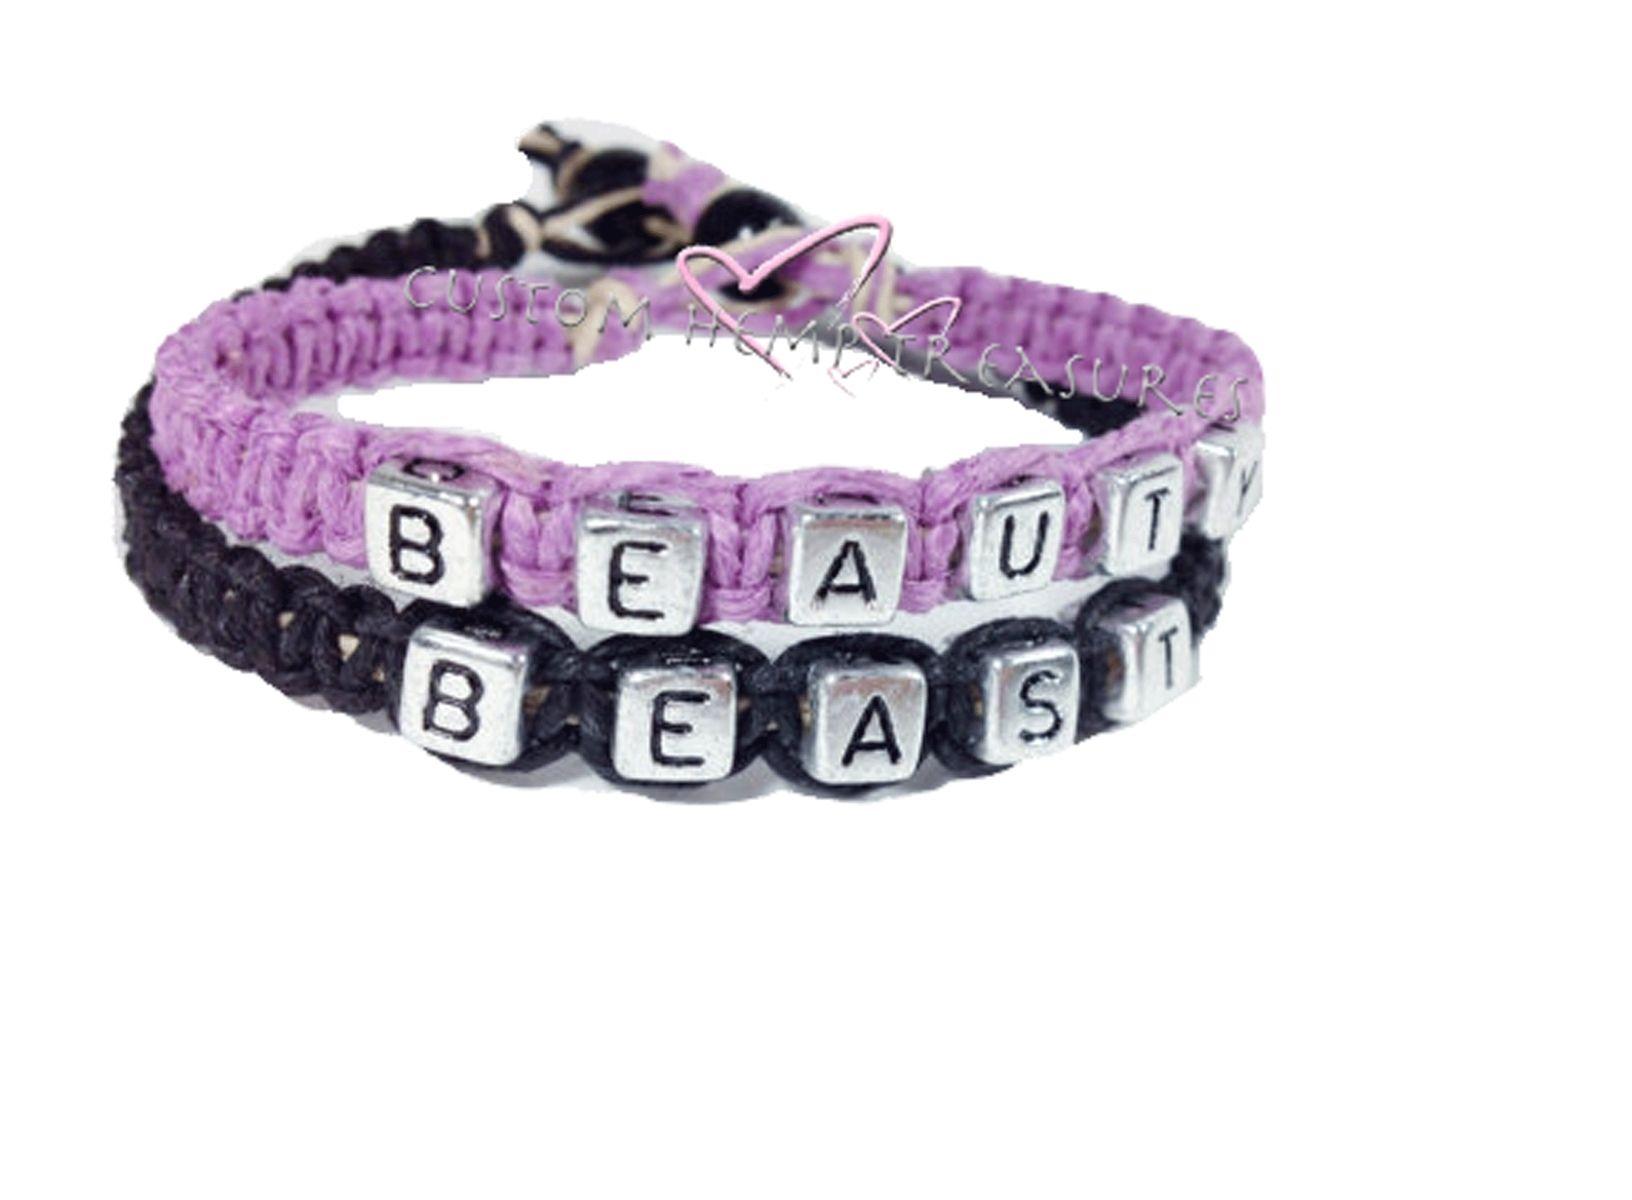 Custom Made Beauty Beast S Bracelets Personalized